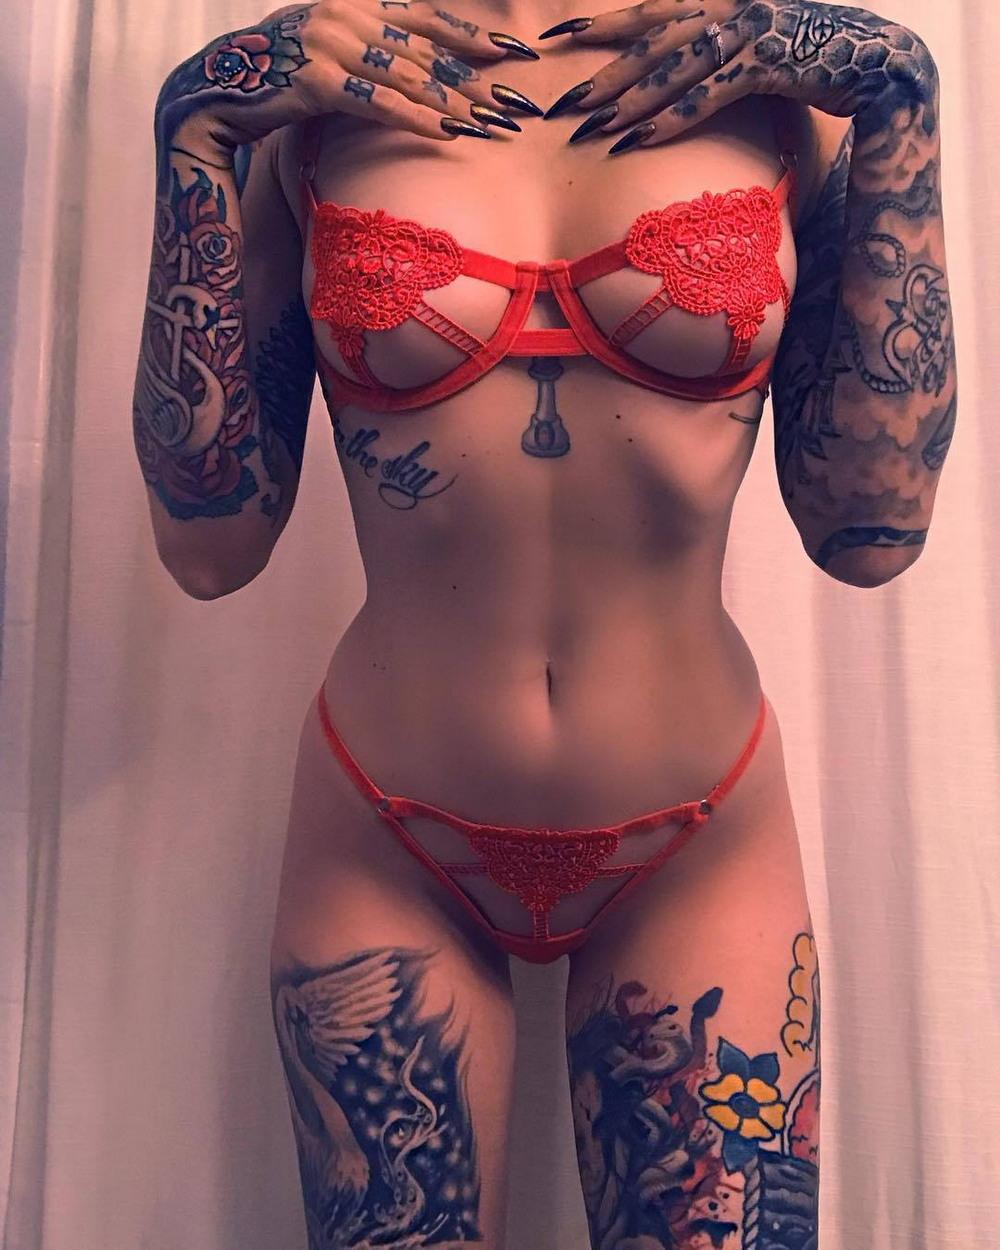 Naked tattoo girl big dan